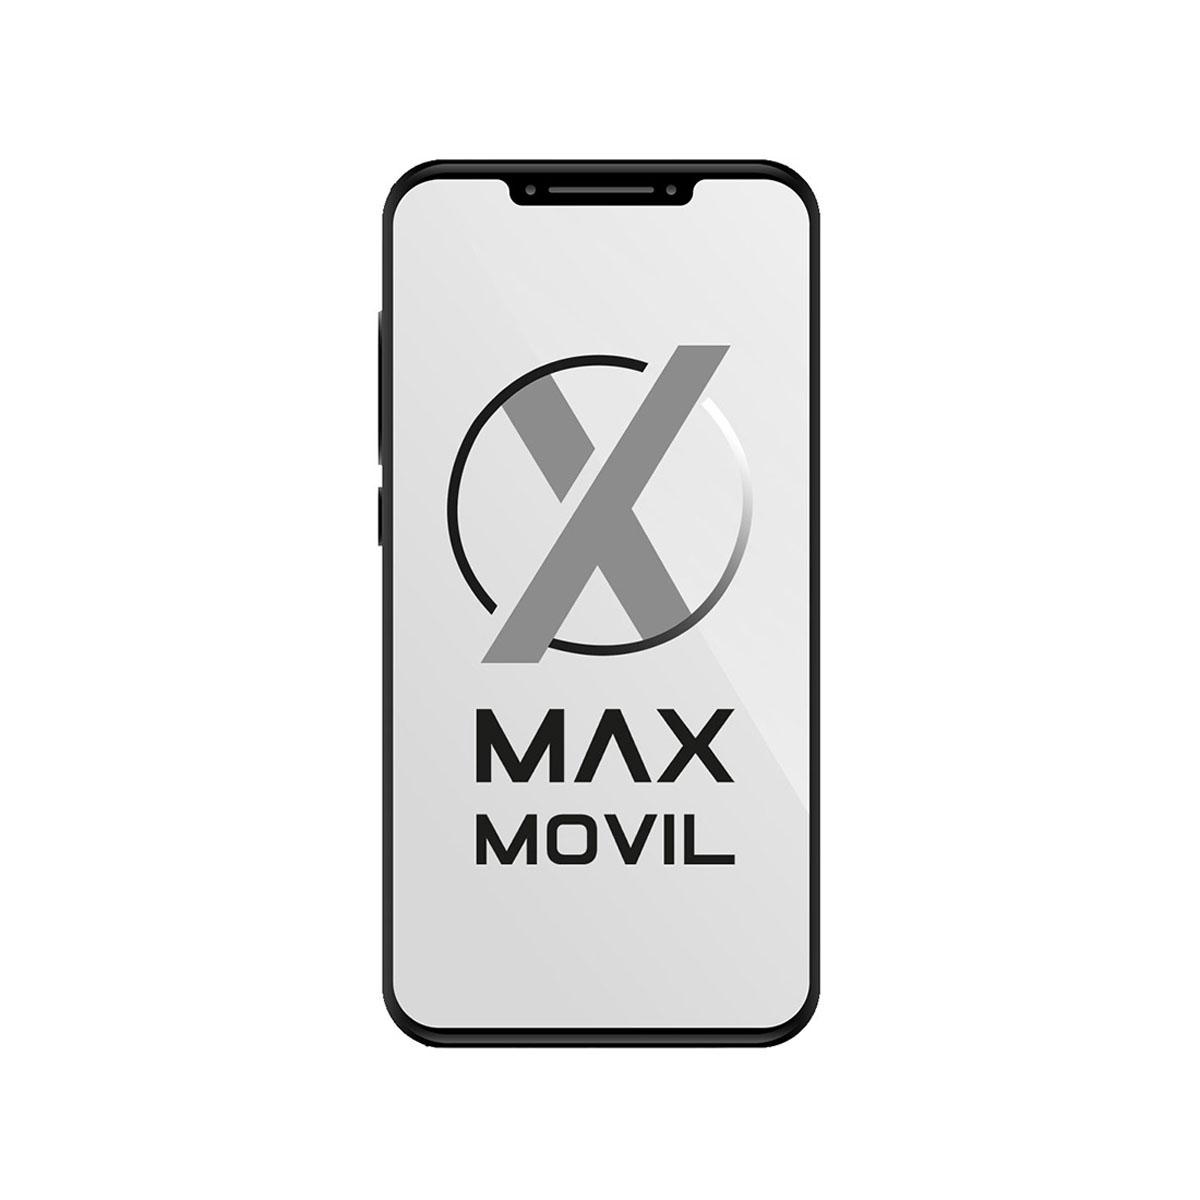 Comprar Huawei Mate S gris online